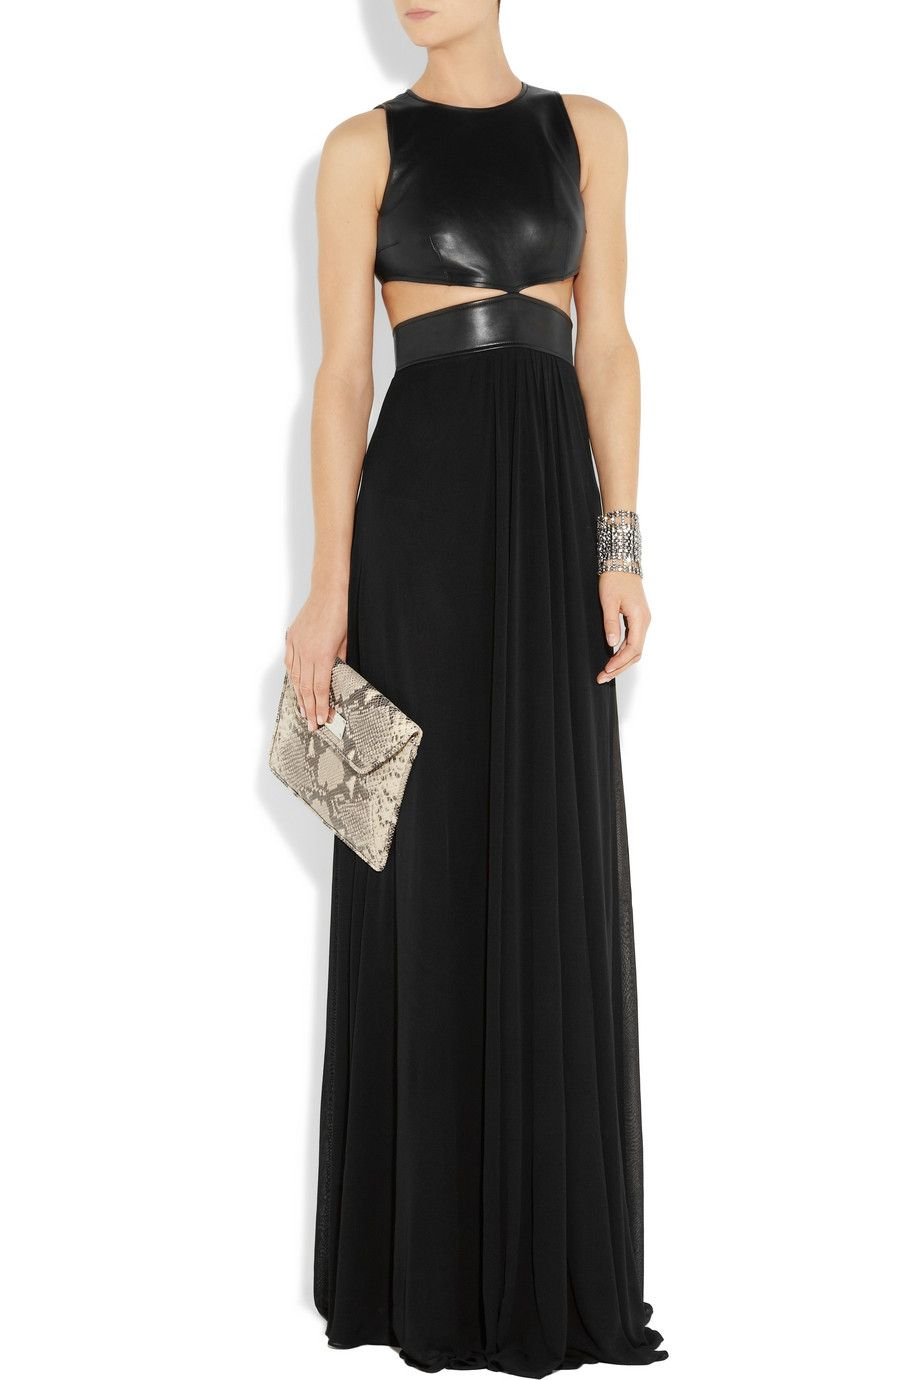 Michael Kors cutout leather gown....badass betch   Fashion ...